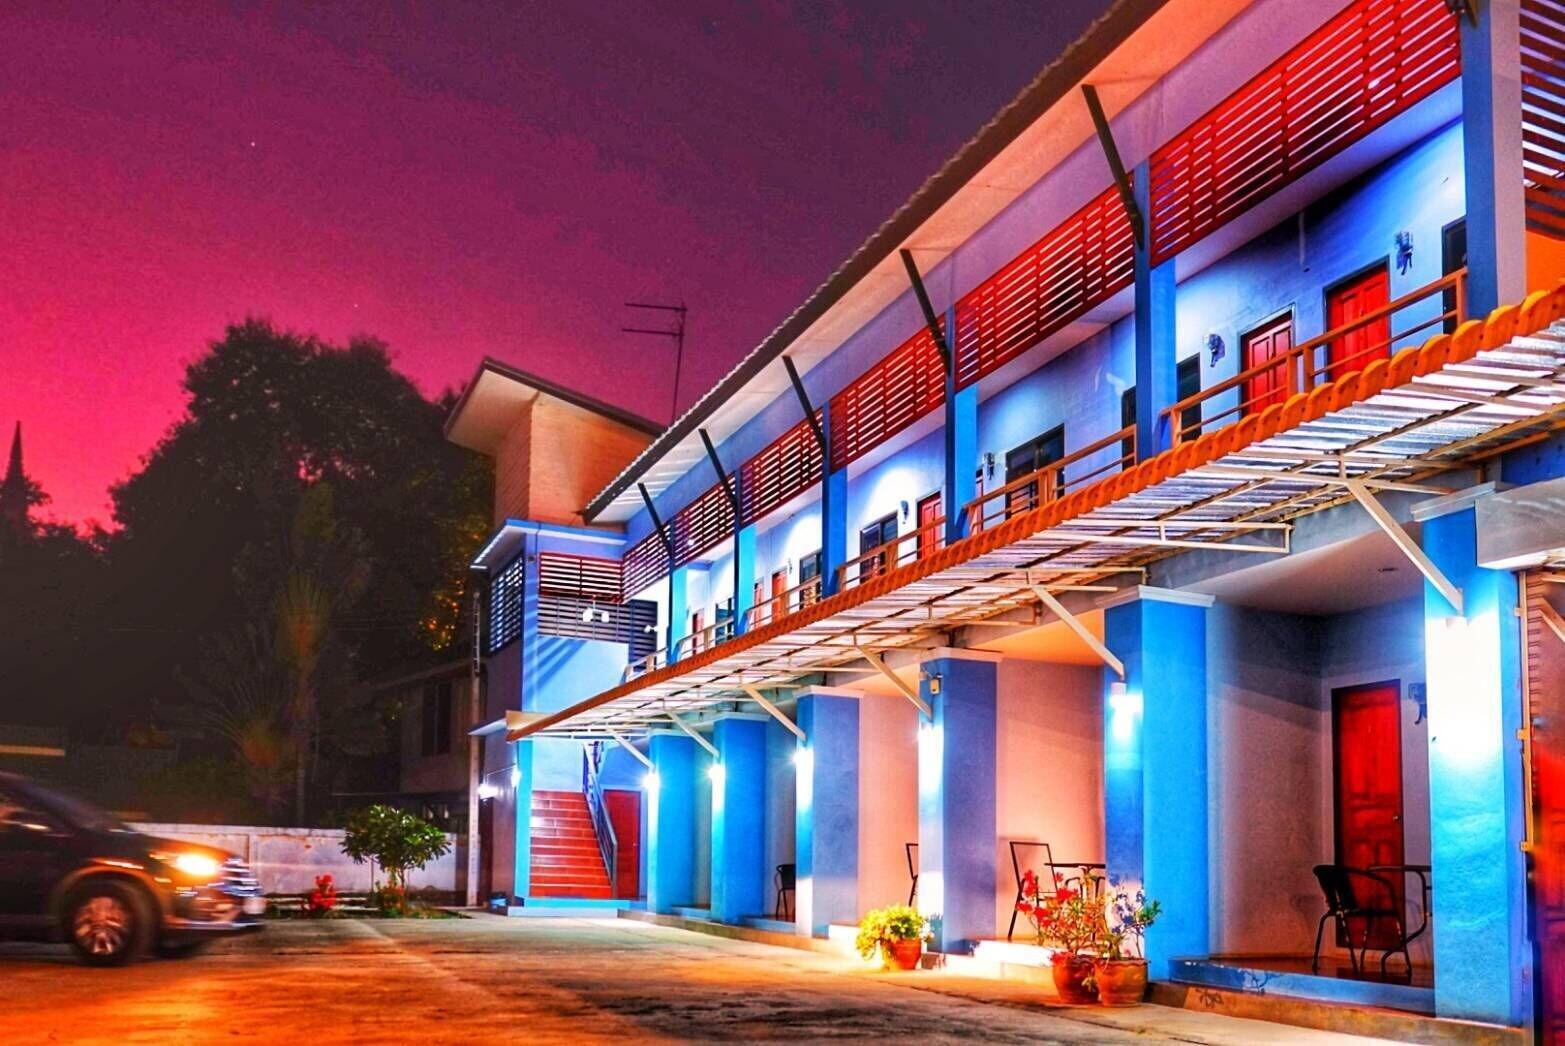 Tararin, Chiang Saen